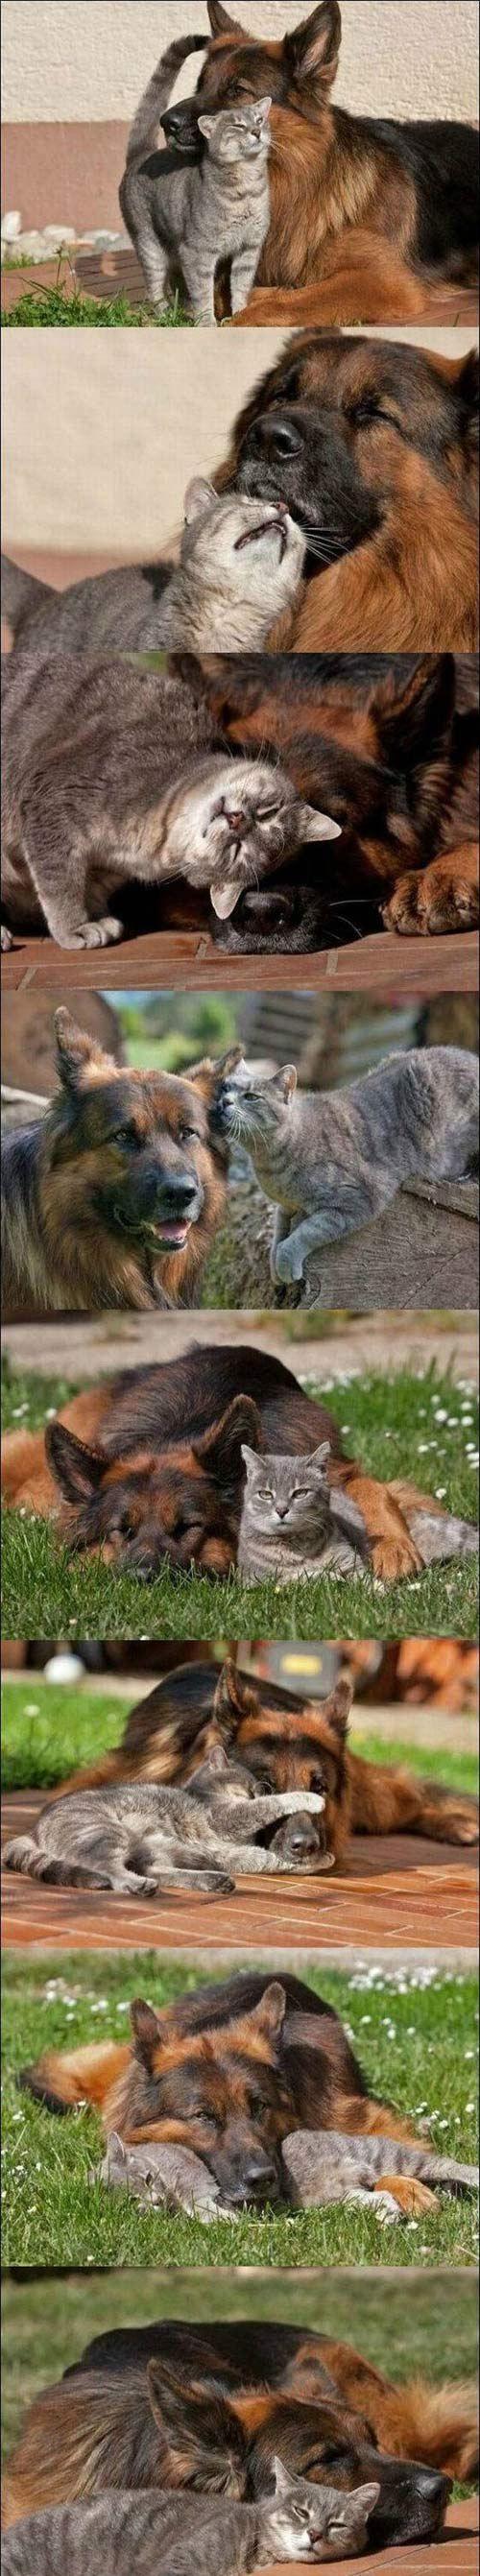 best einfach freunde images on pinterest best friends cutest